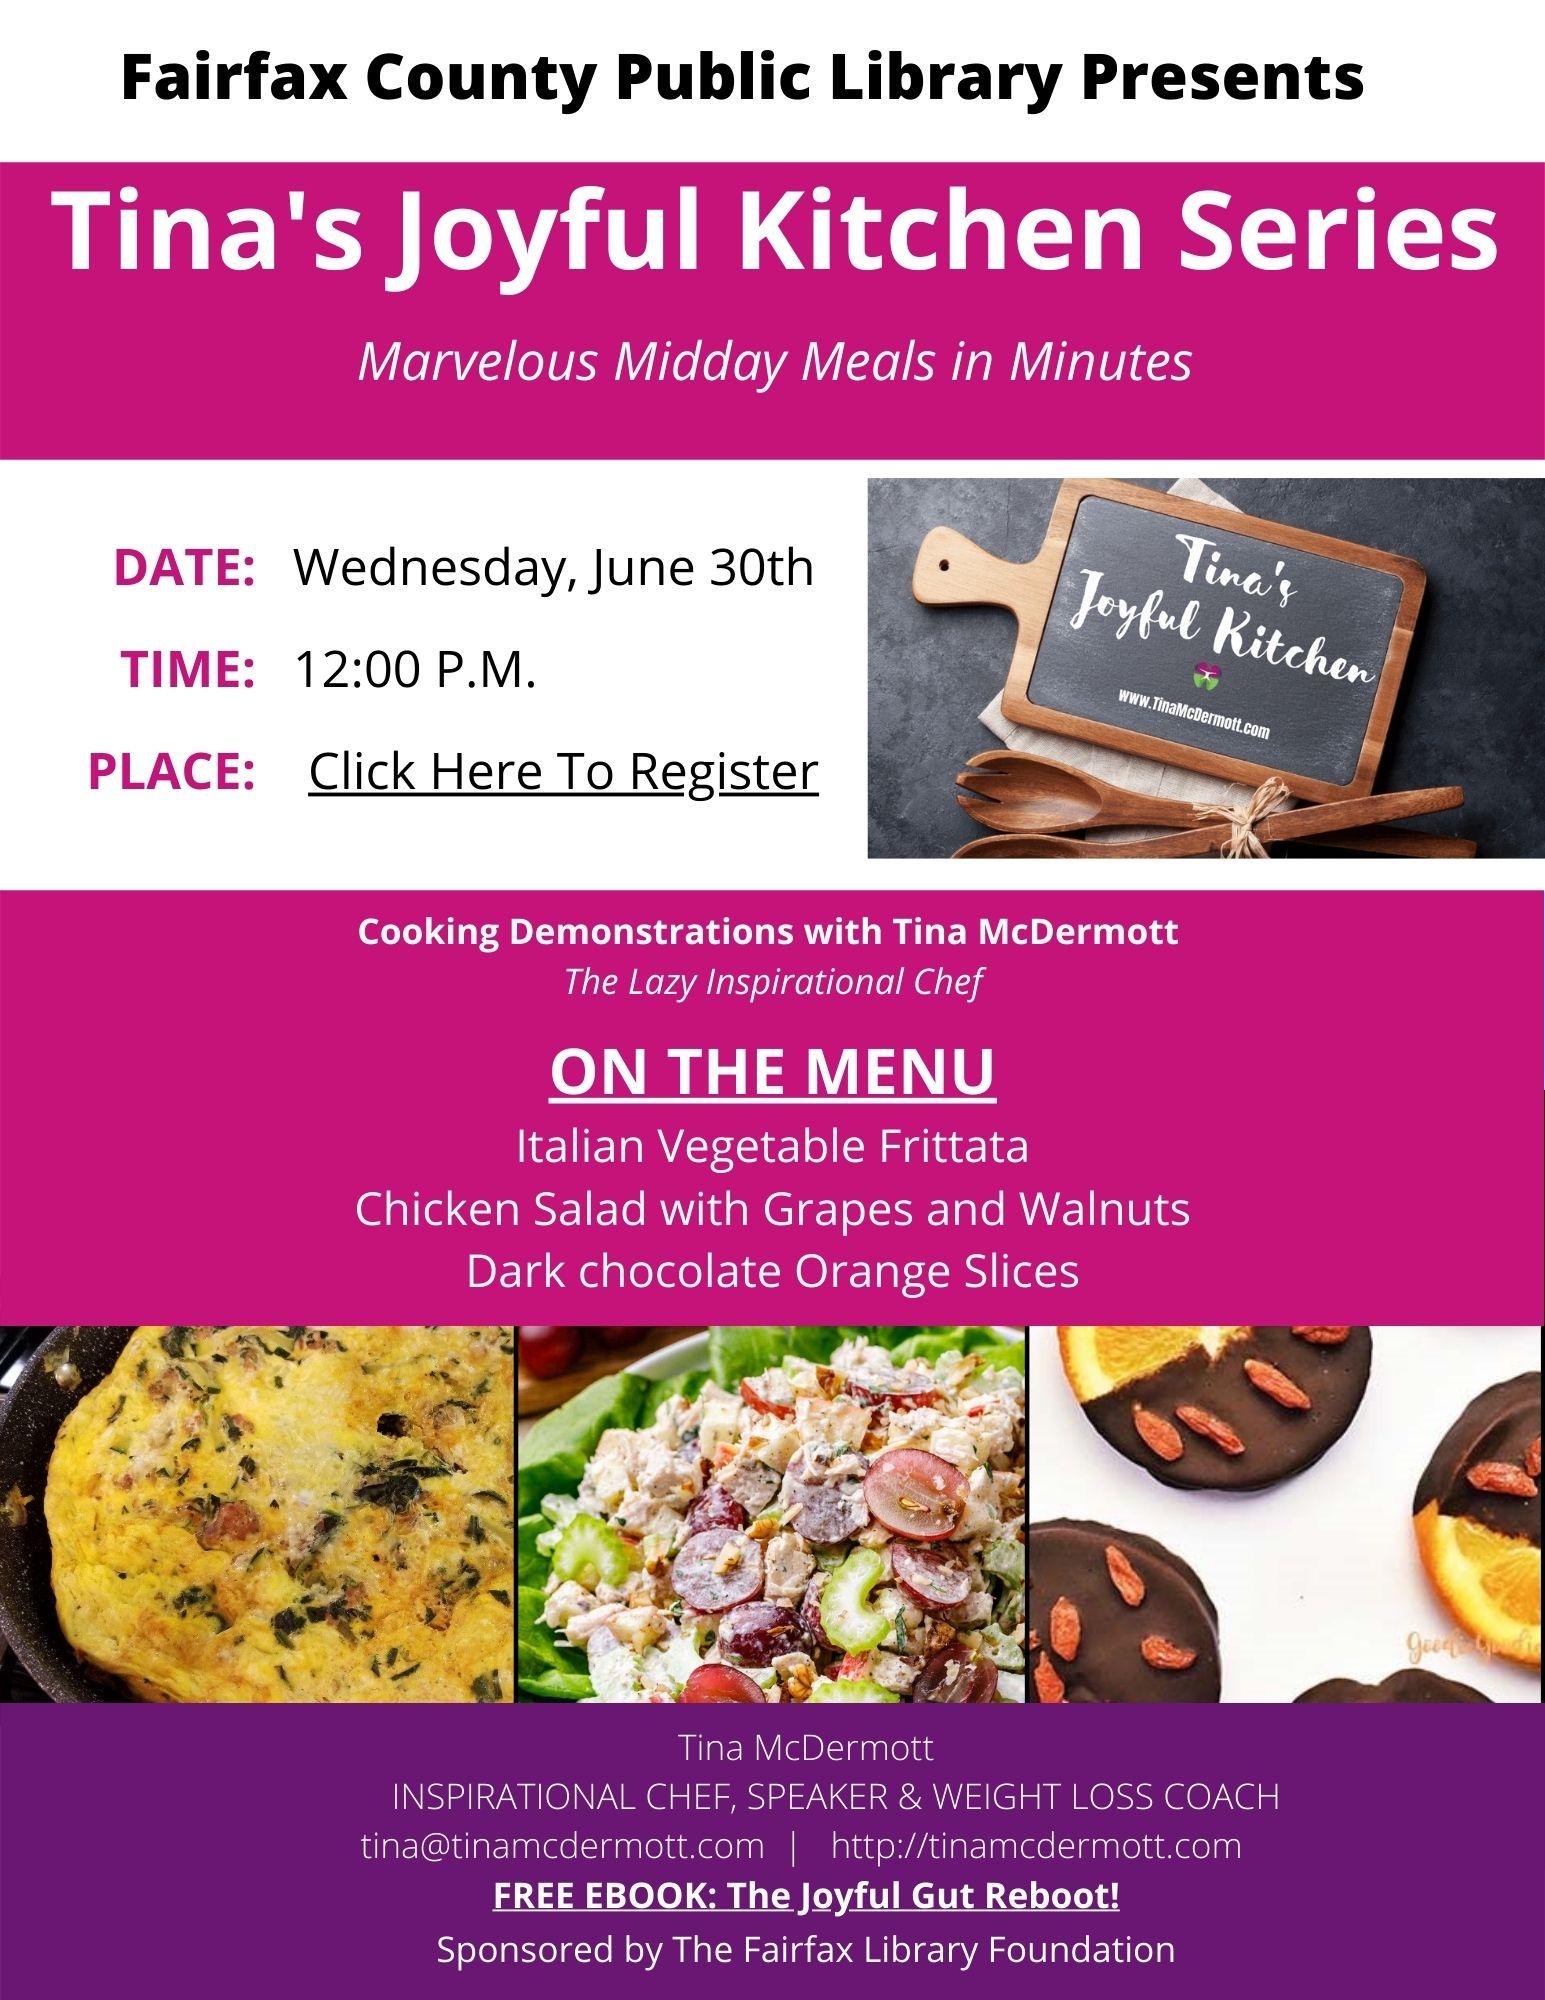 Tina's Joyful Kitchen series: Professional Wellness Month